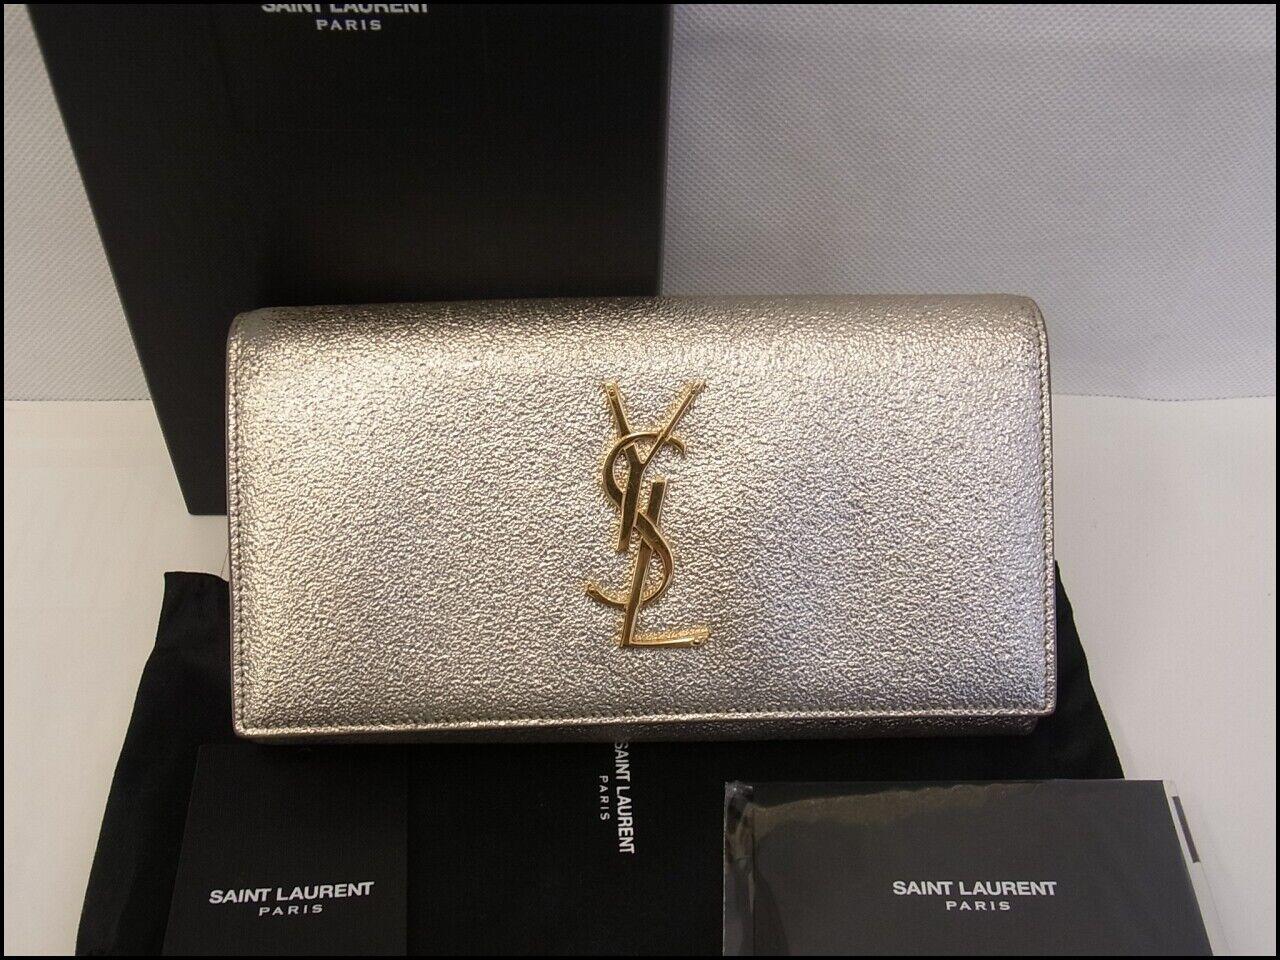 Auth KAN13 SAINT LAURENT Cassandra flap wallet YSL Gold hardware from Japan